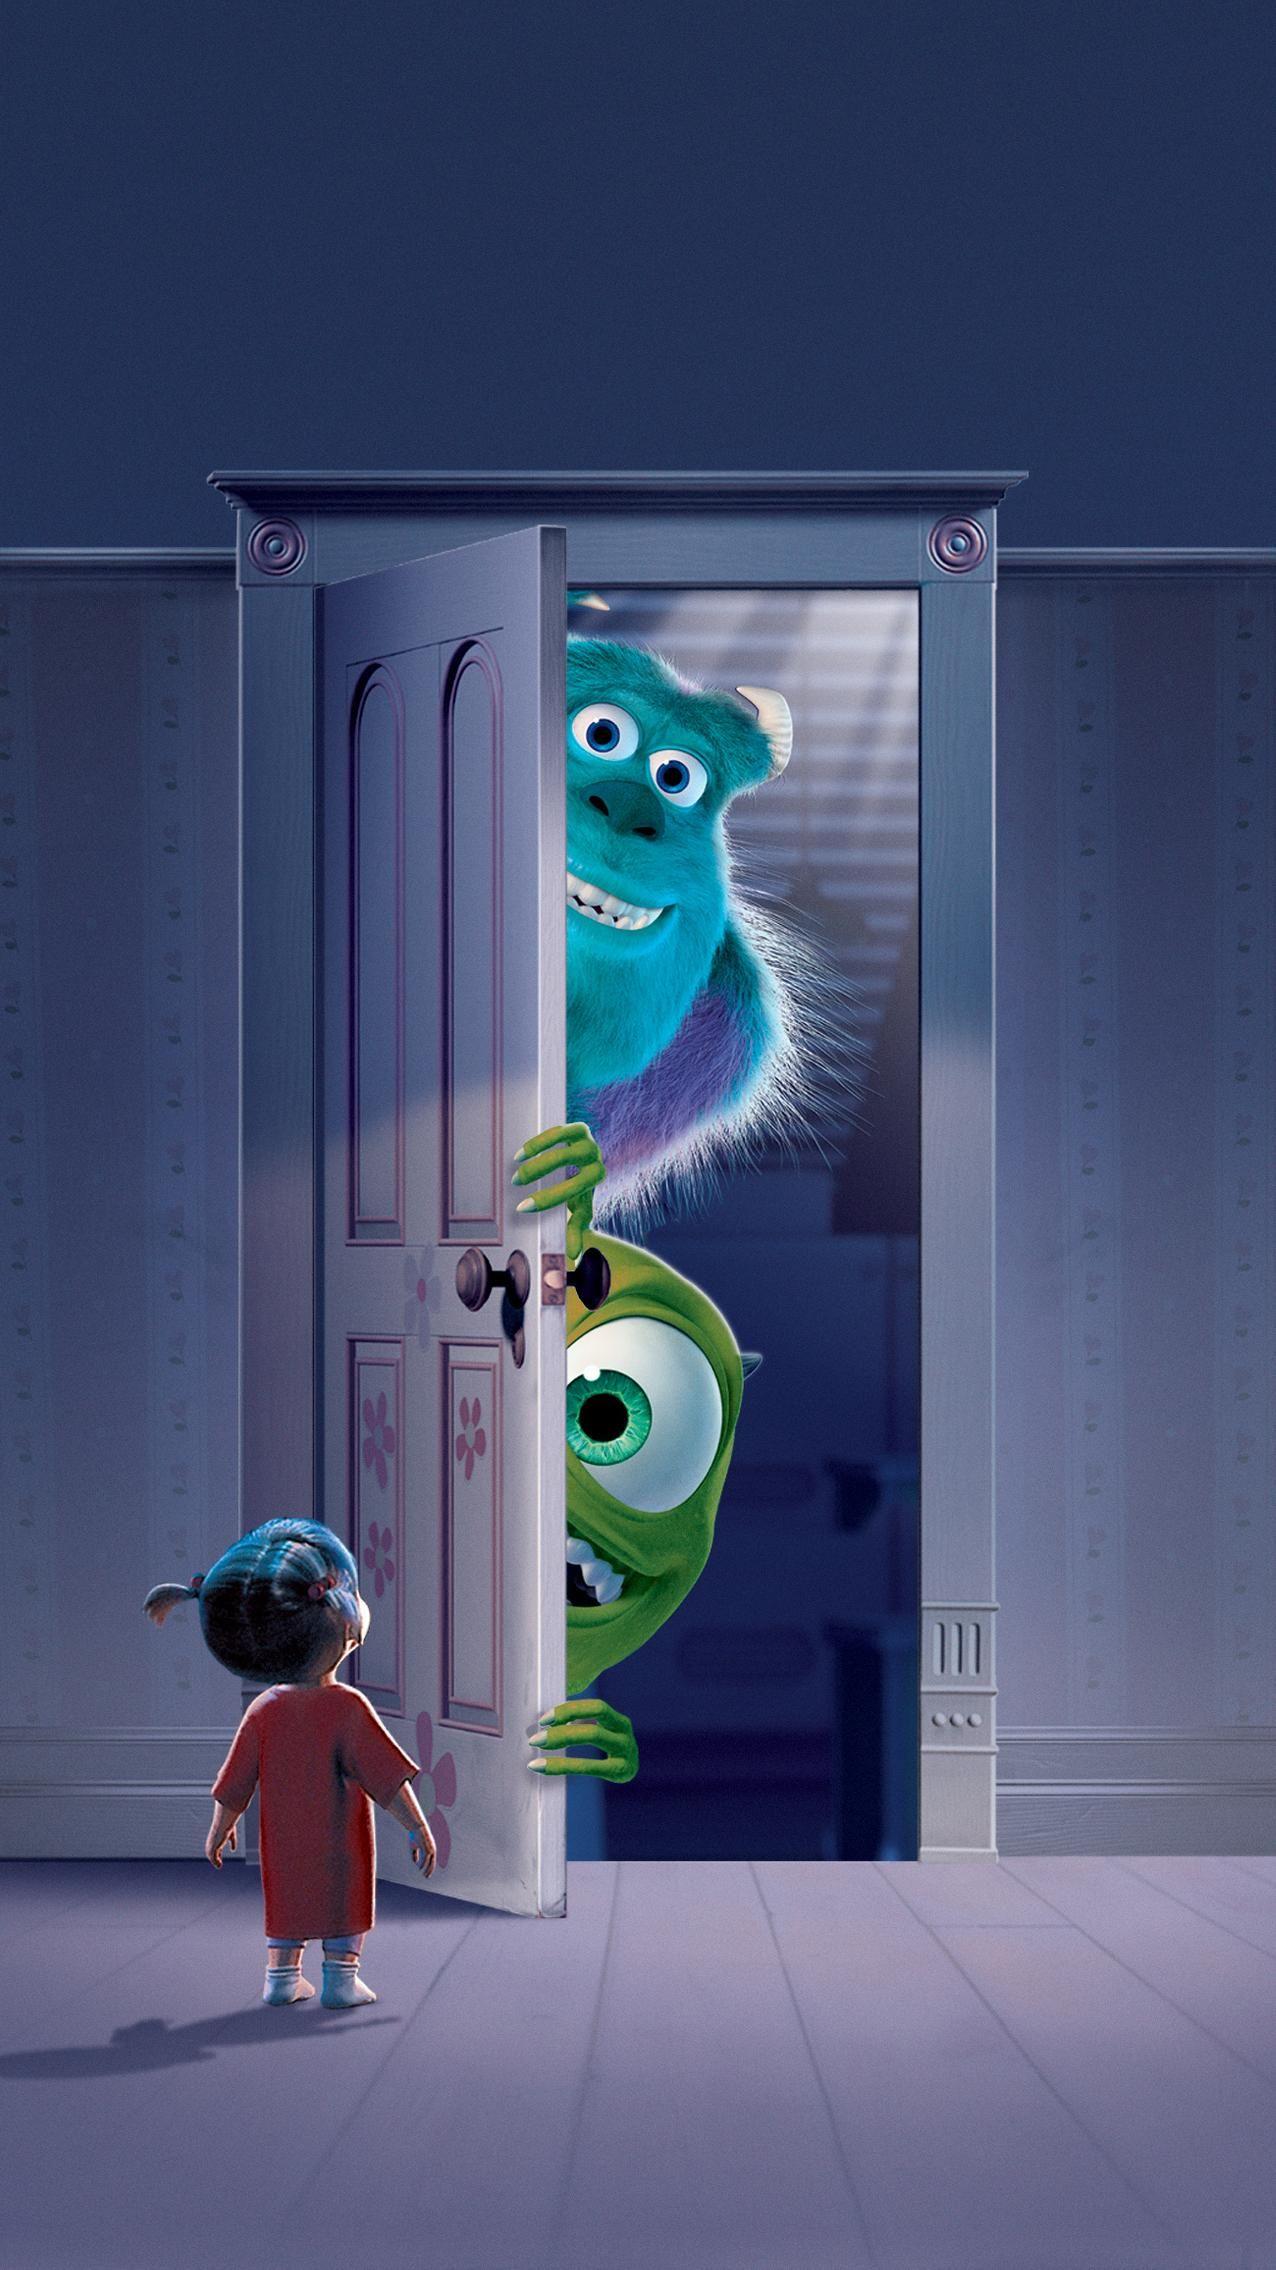 Toy Story 2 (1999) Phone Wallpaper Дисней картины